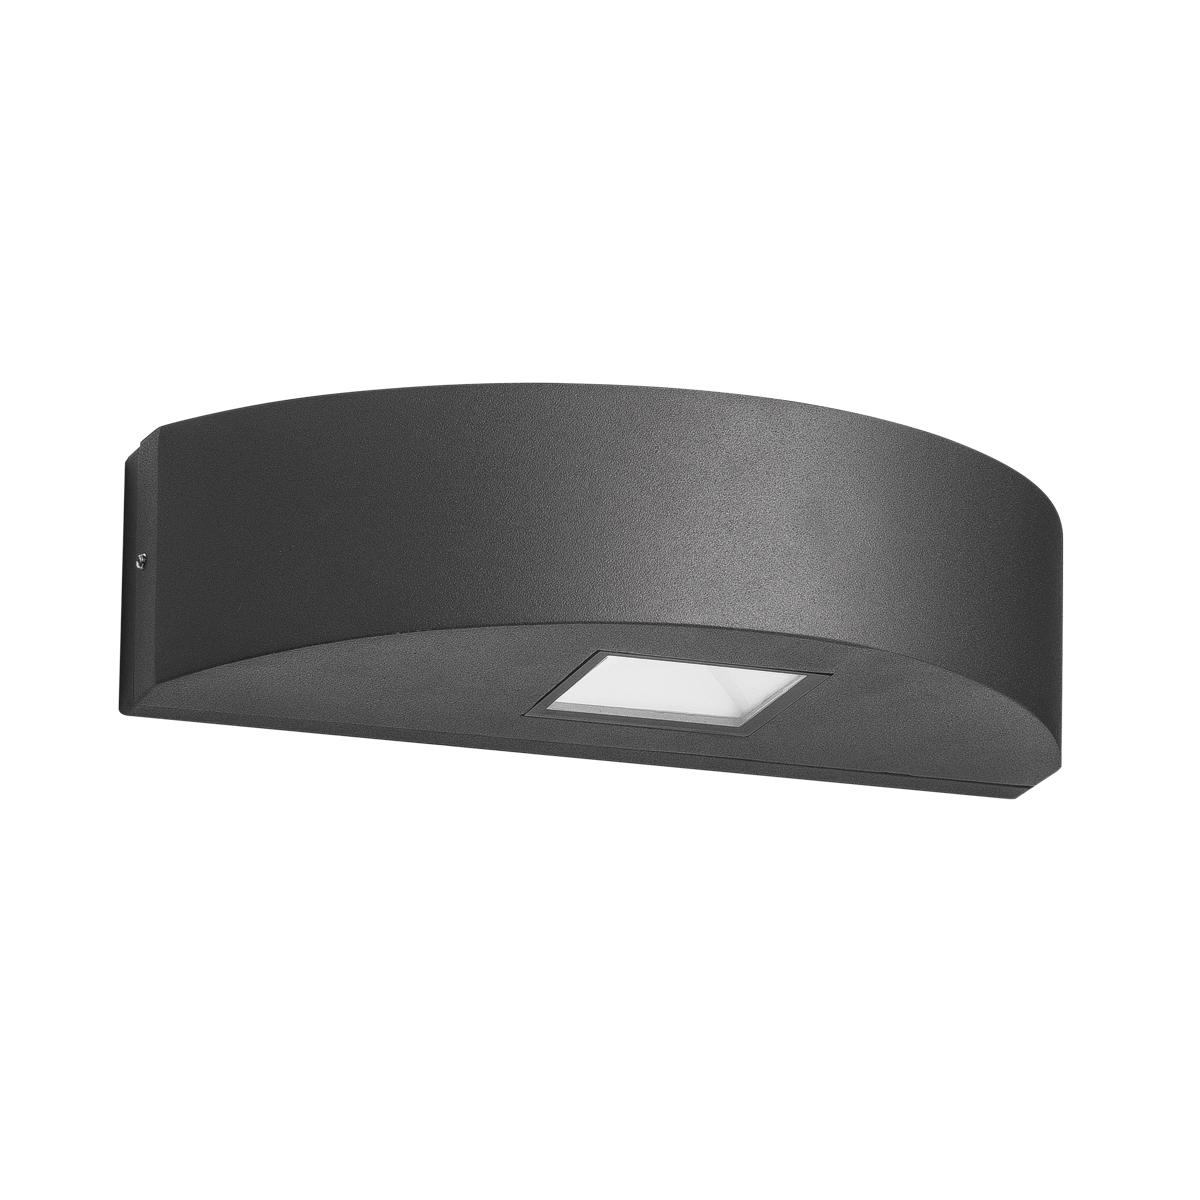 VK LED Φωτιστικό Απλίκα 6W VK02041 IP54